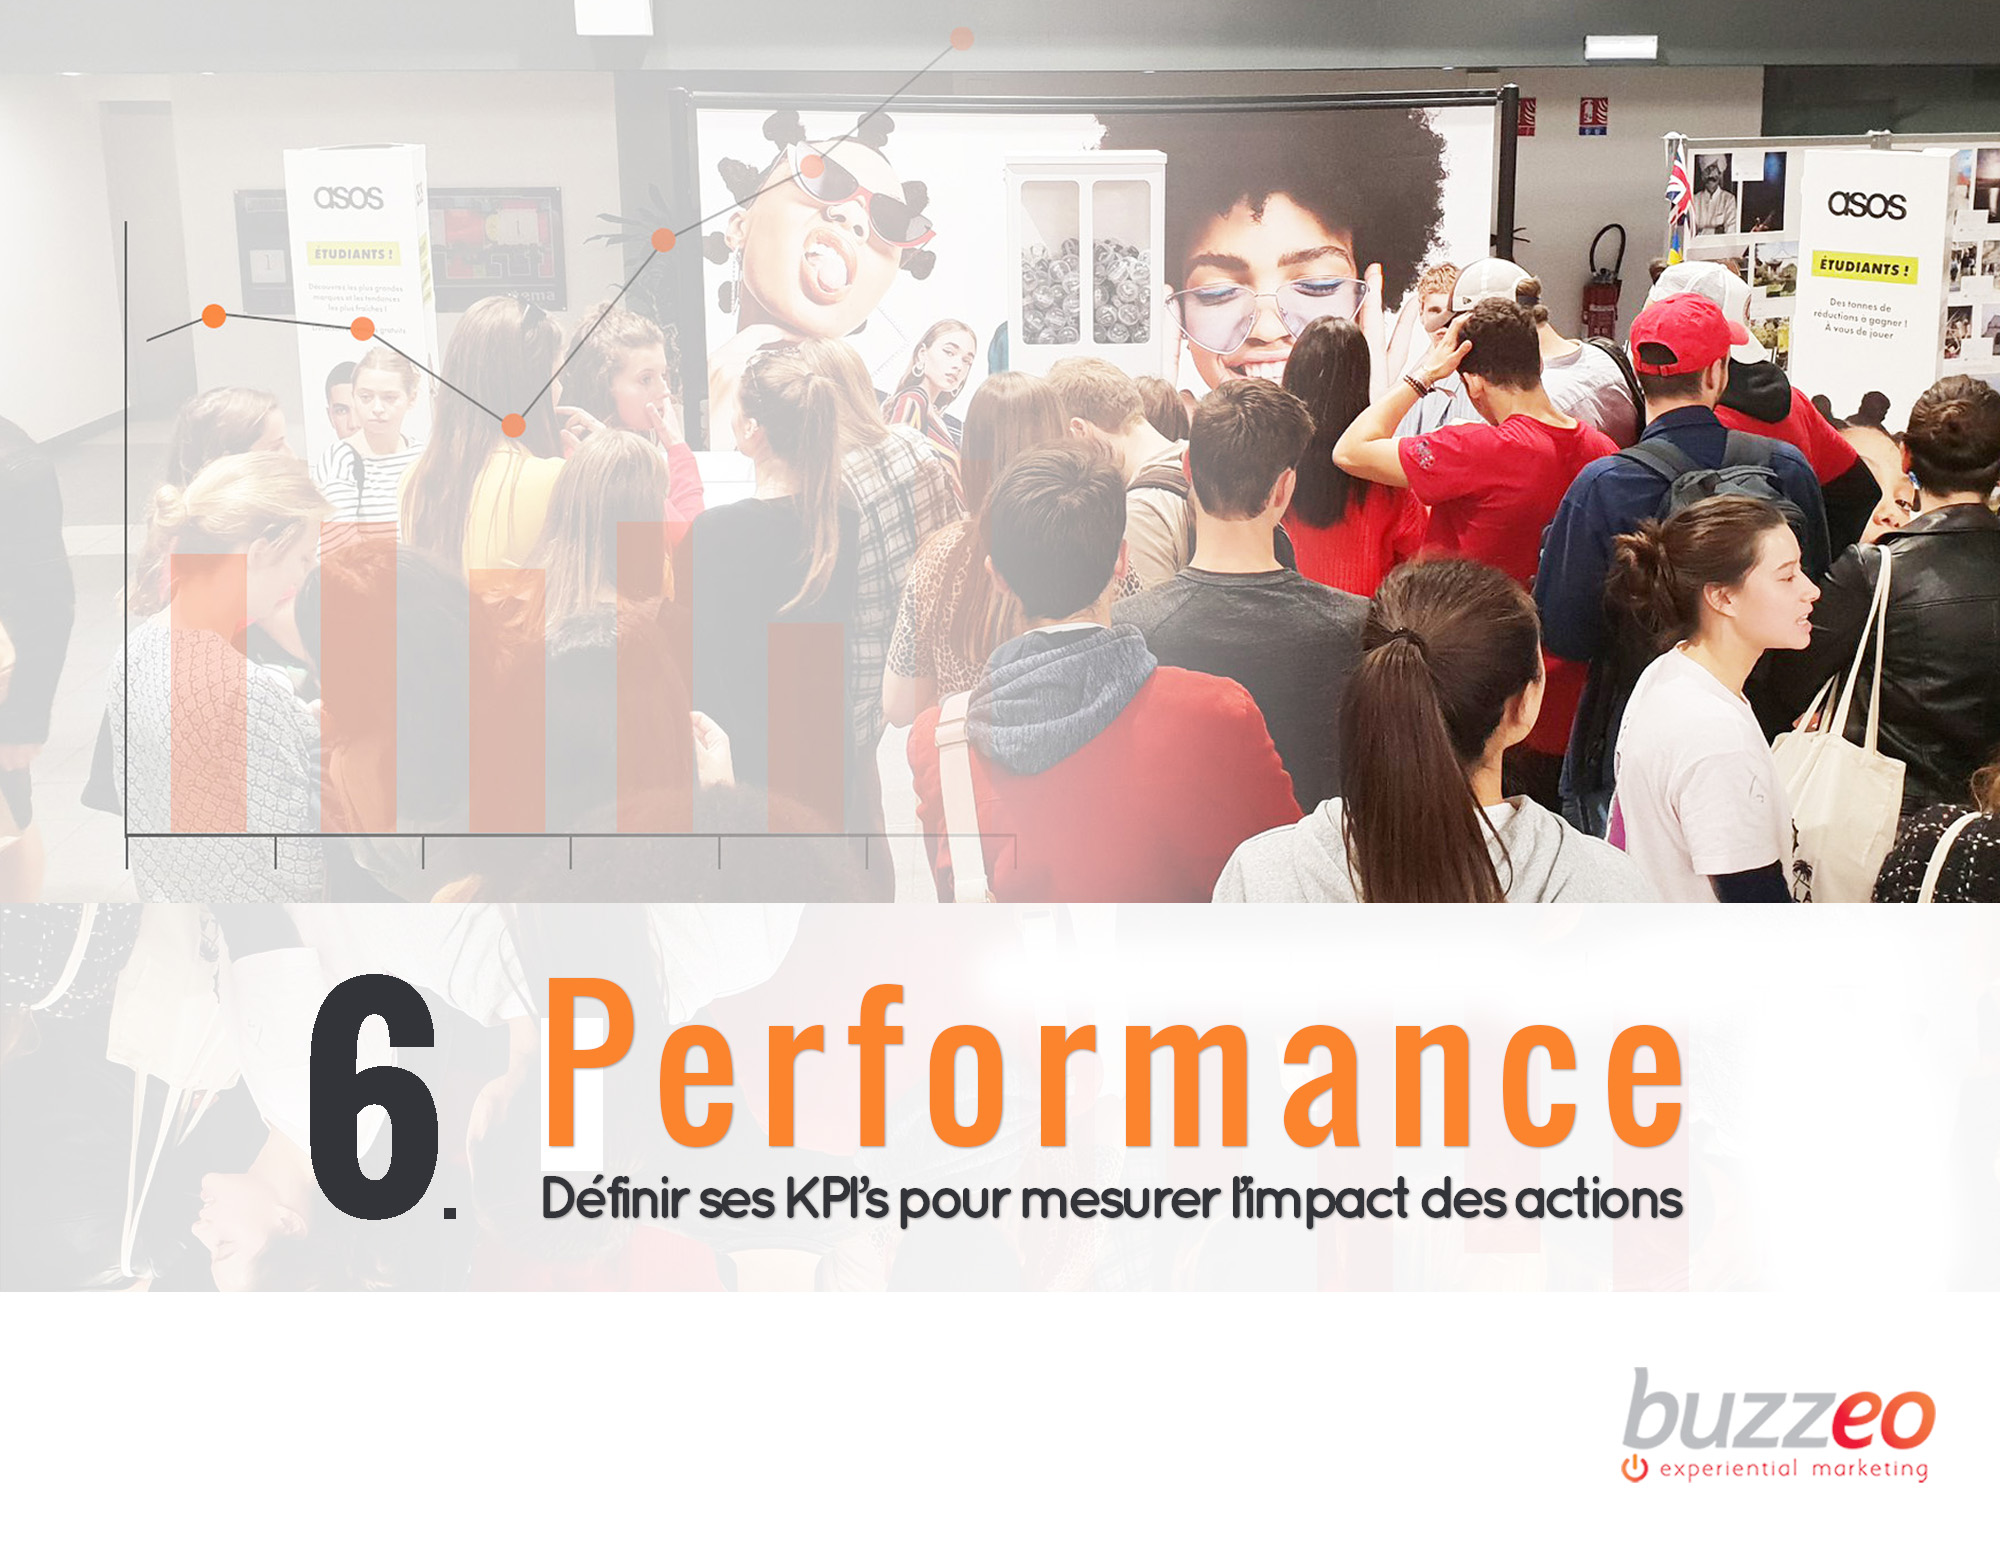 performance - Keemia Shopper - l'agence de marketing d'activation shopper phygital